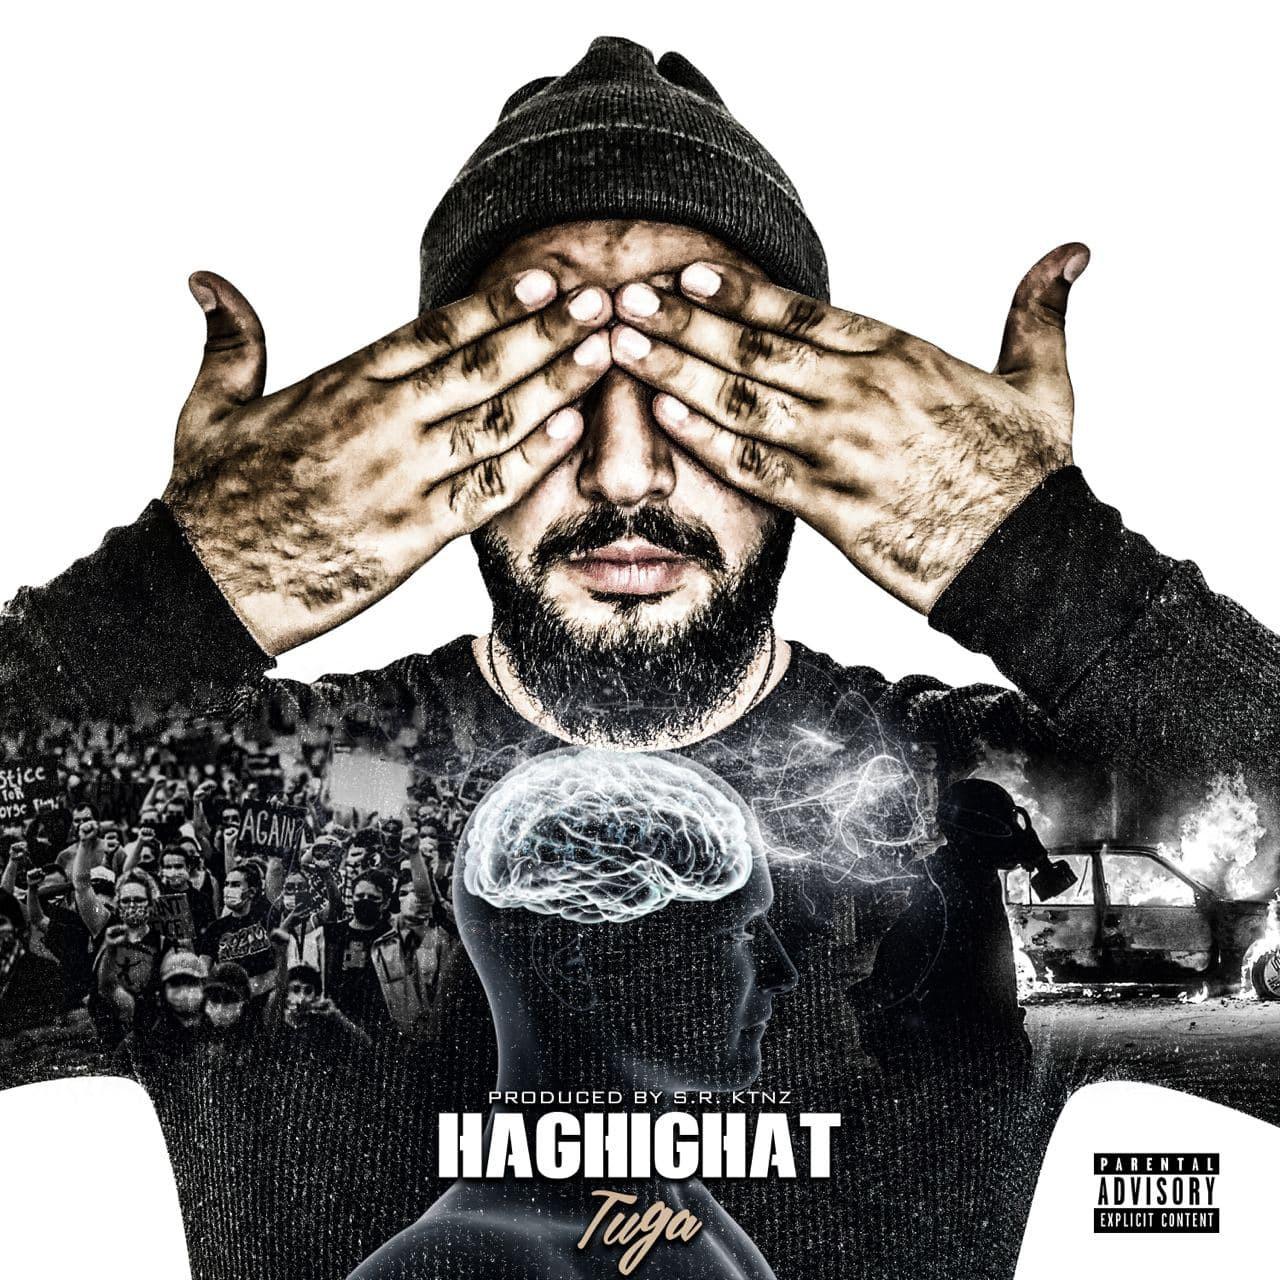 Tuga - Haghighat